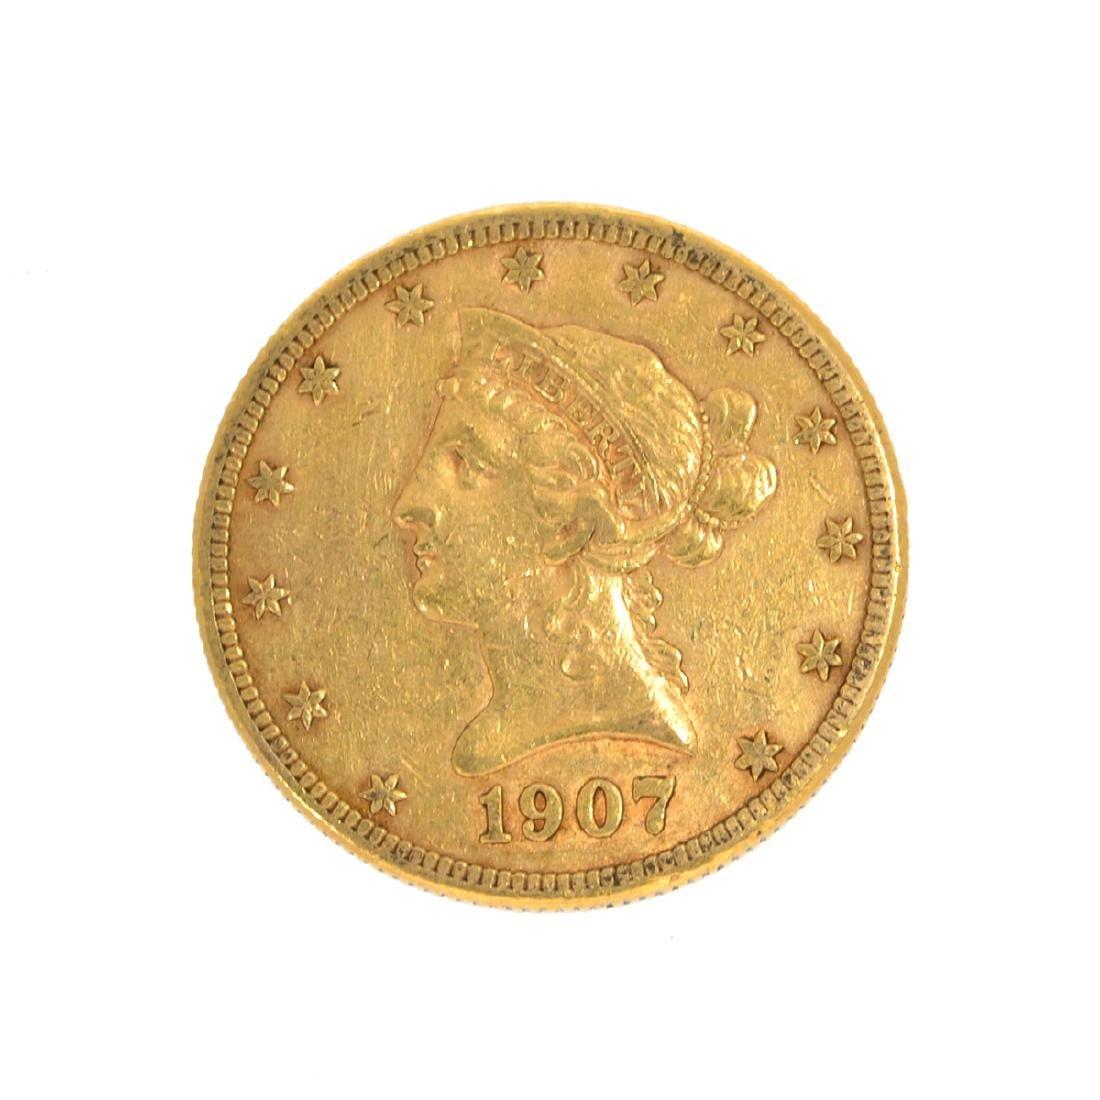 *1907-S $10 U.S. Liberty Head Gold Coin (DF)